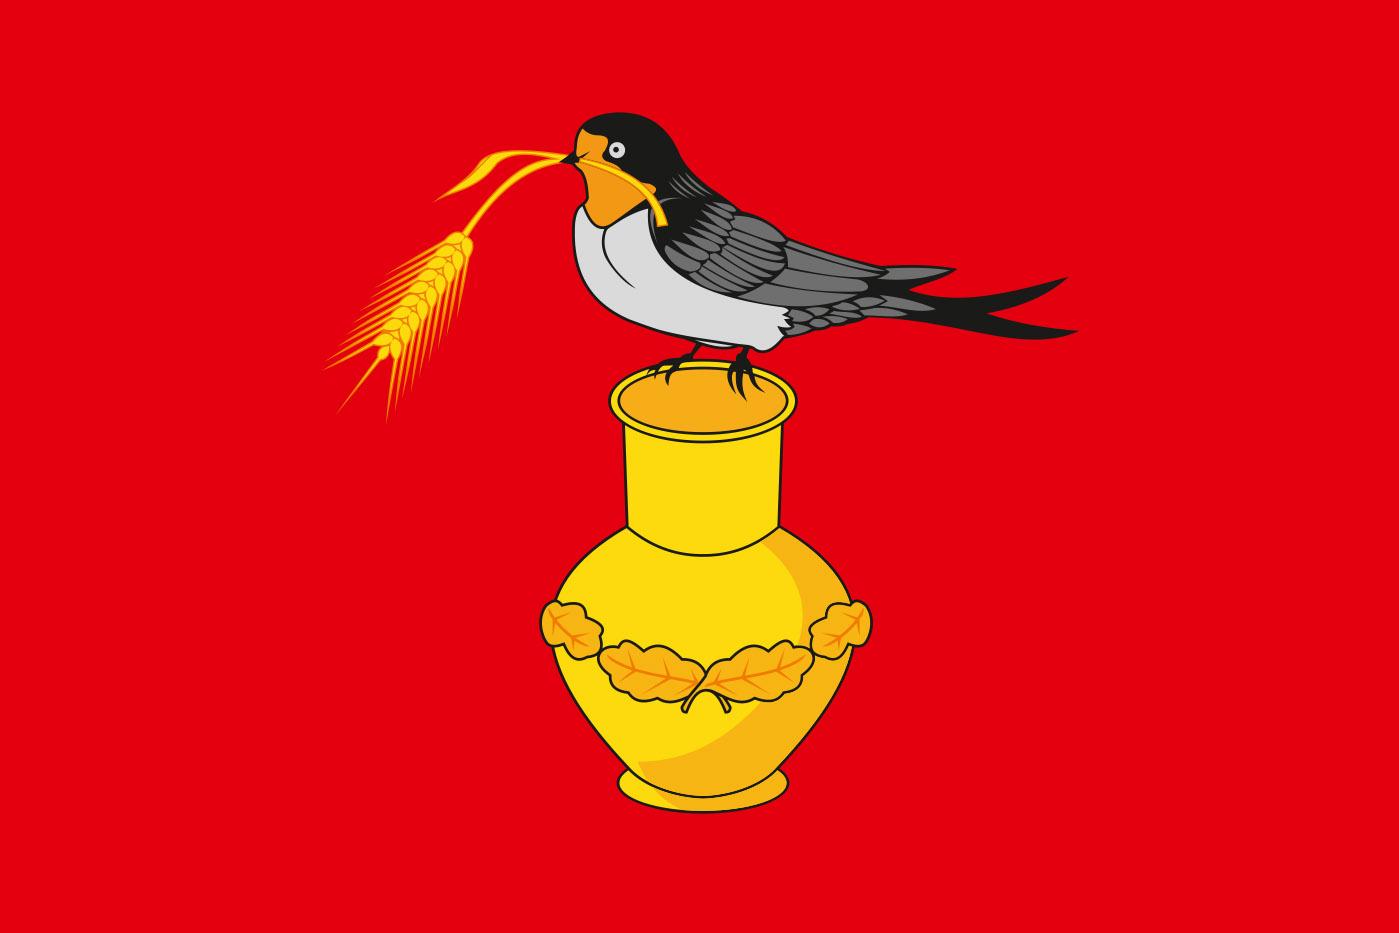 Флаг Измалковского района